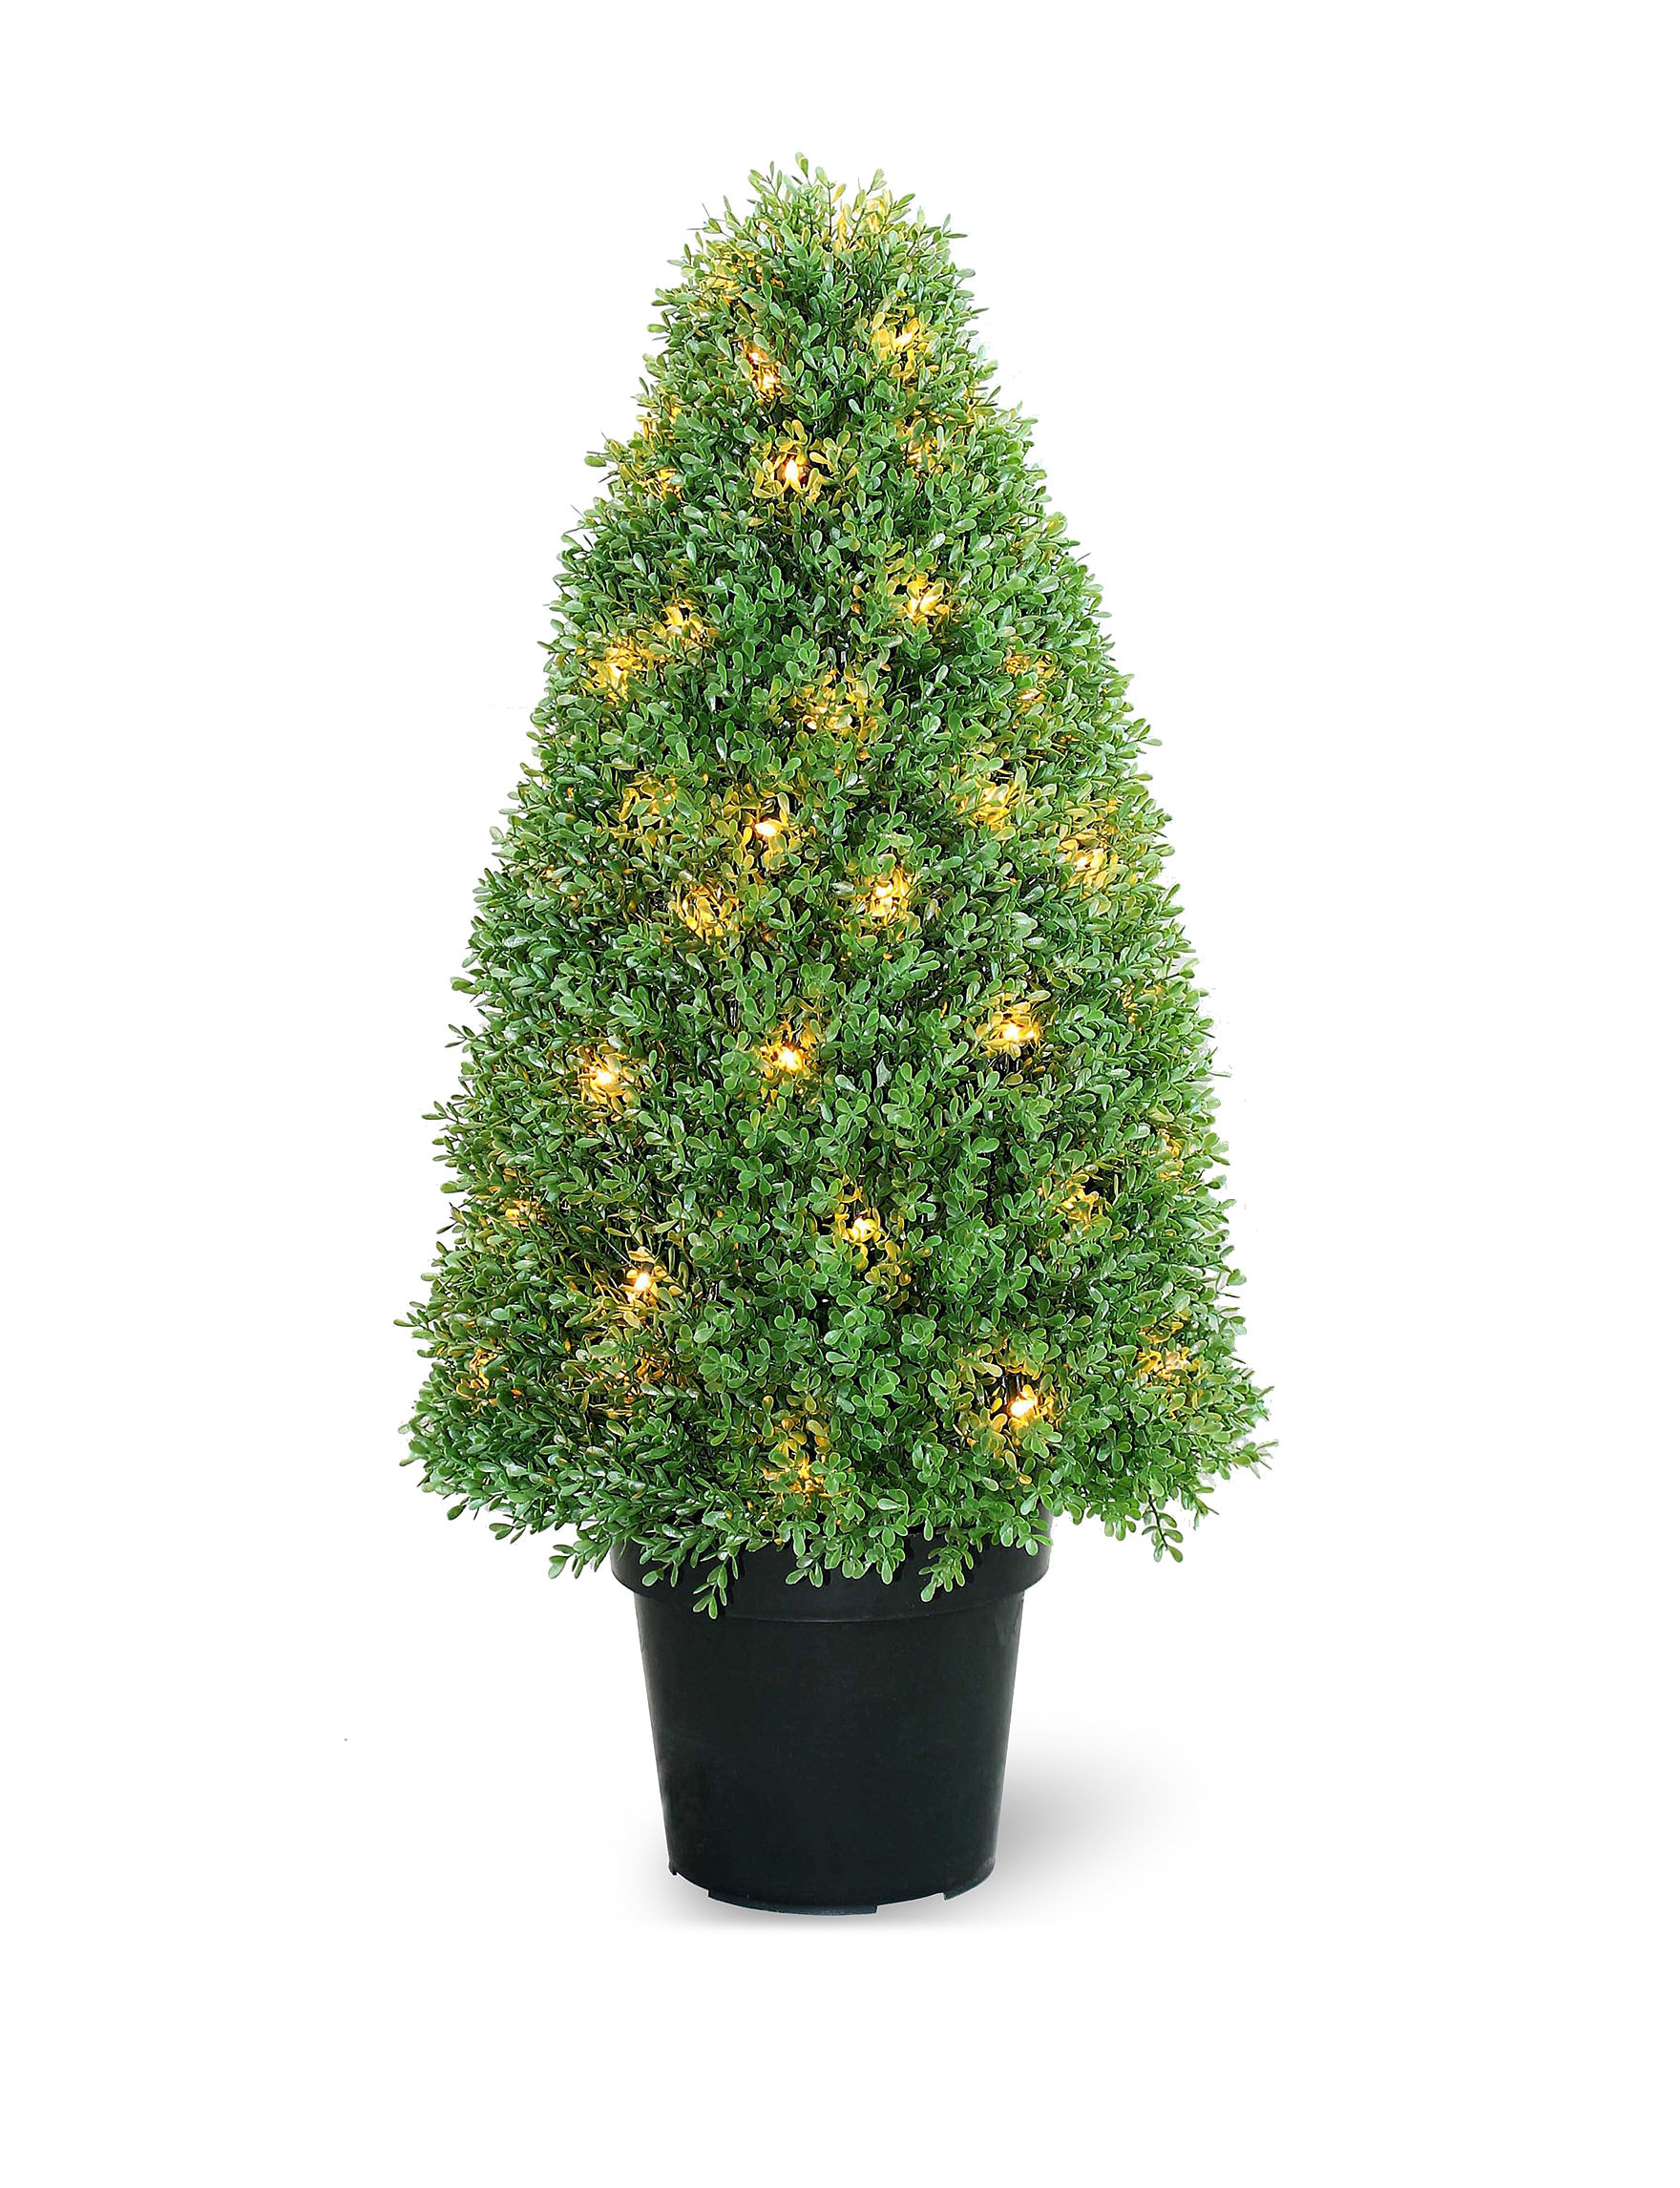 Outdoor Decor Company National Tree Company 36 Inch Pre Lit Boxwood Tree With Pot